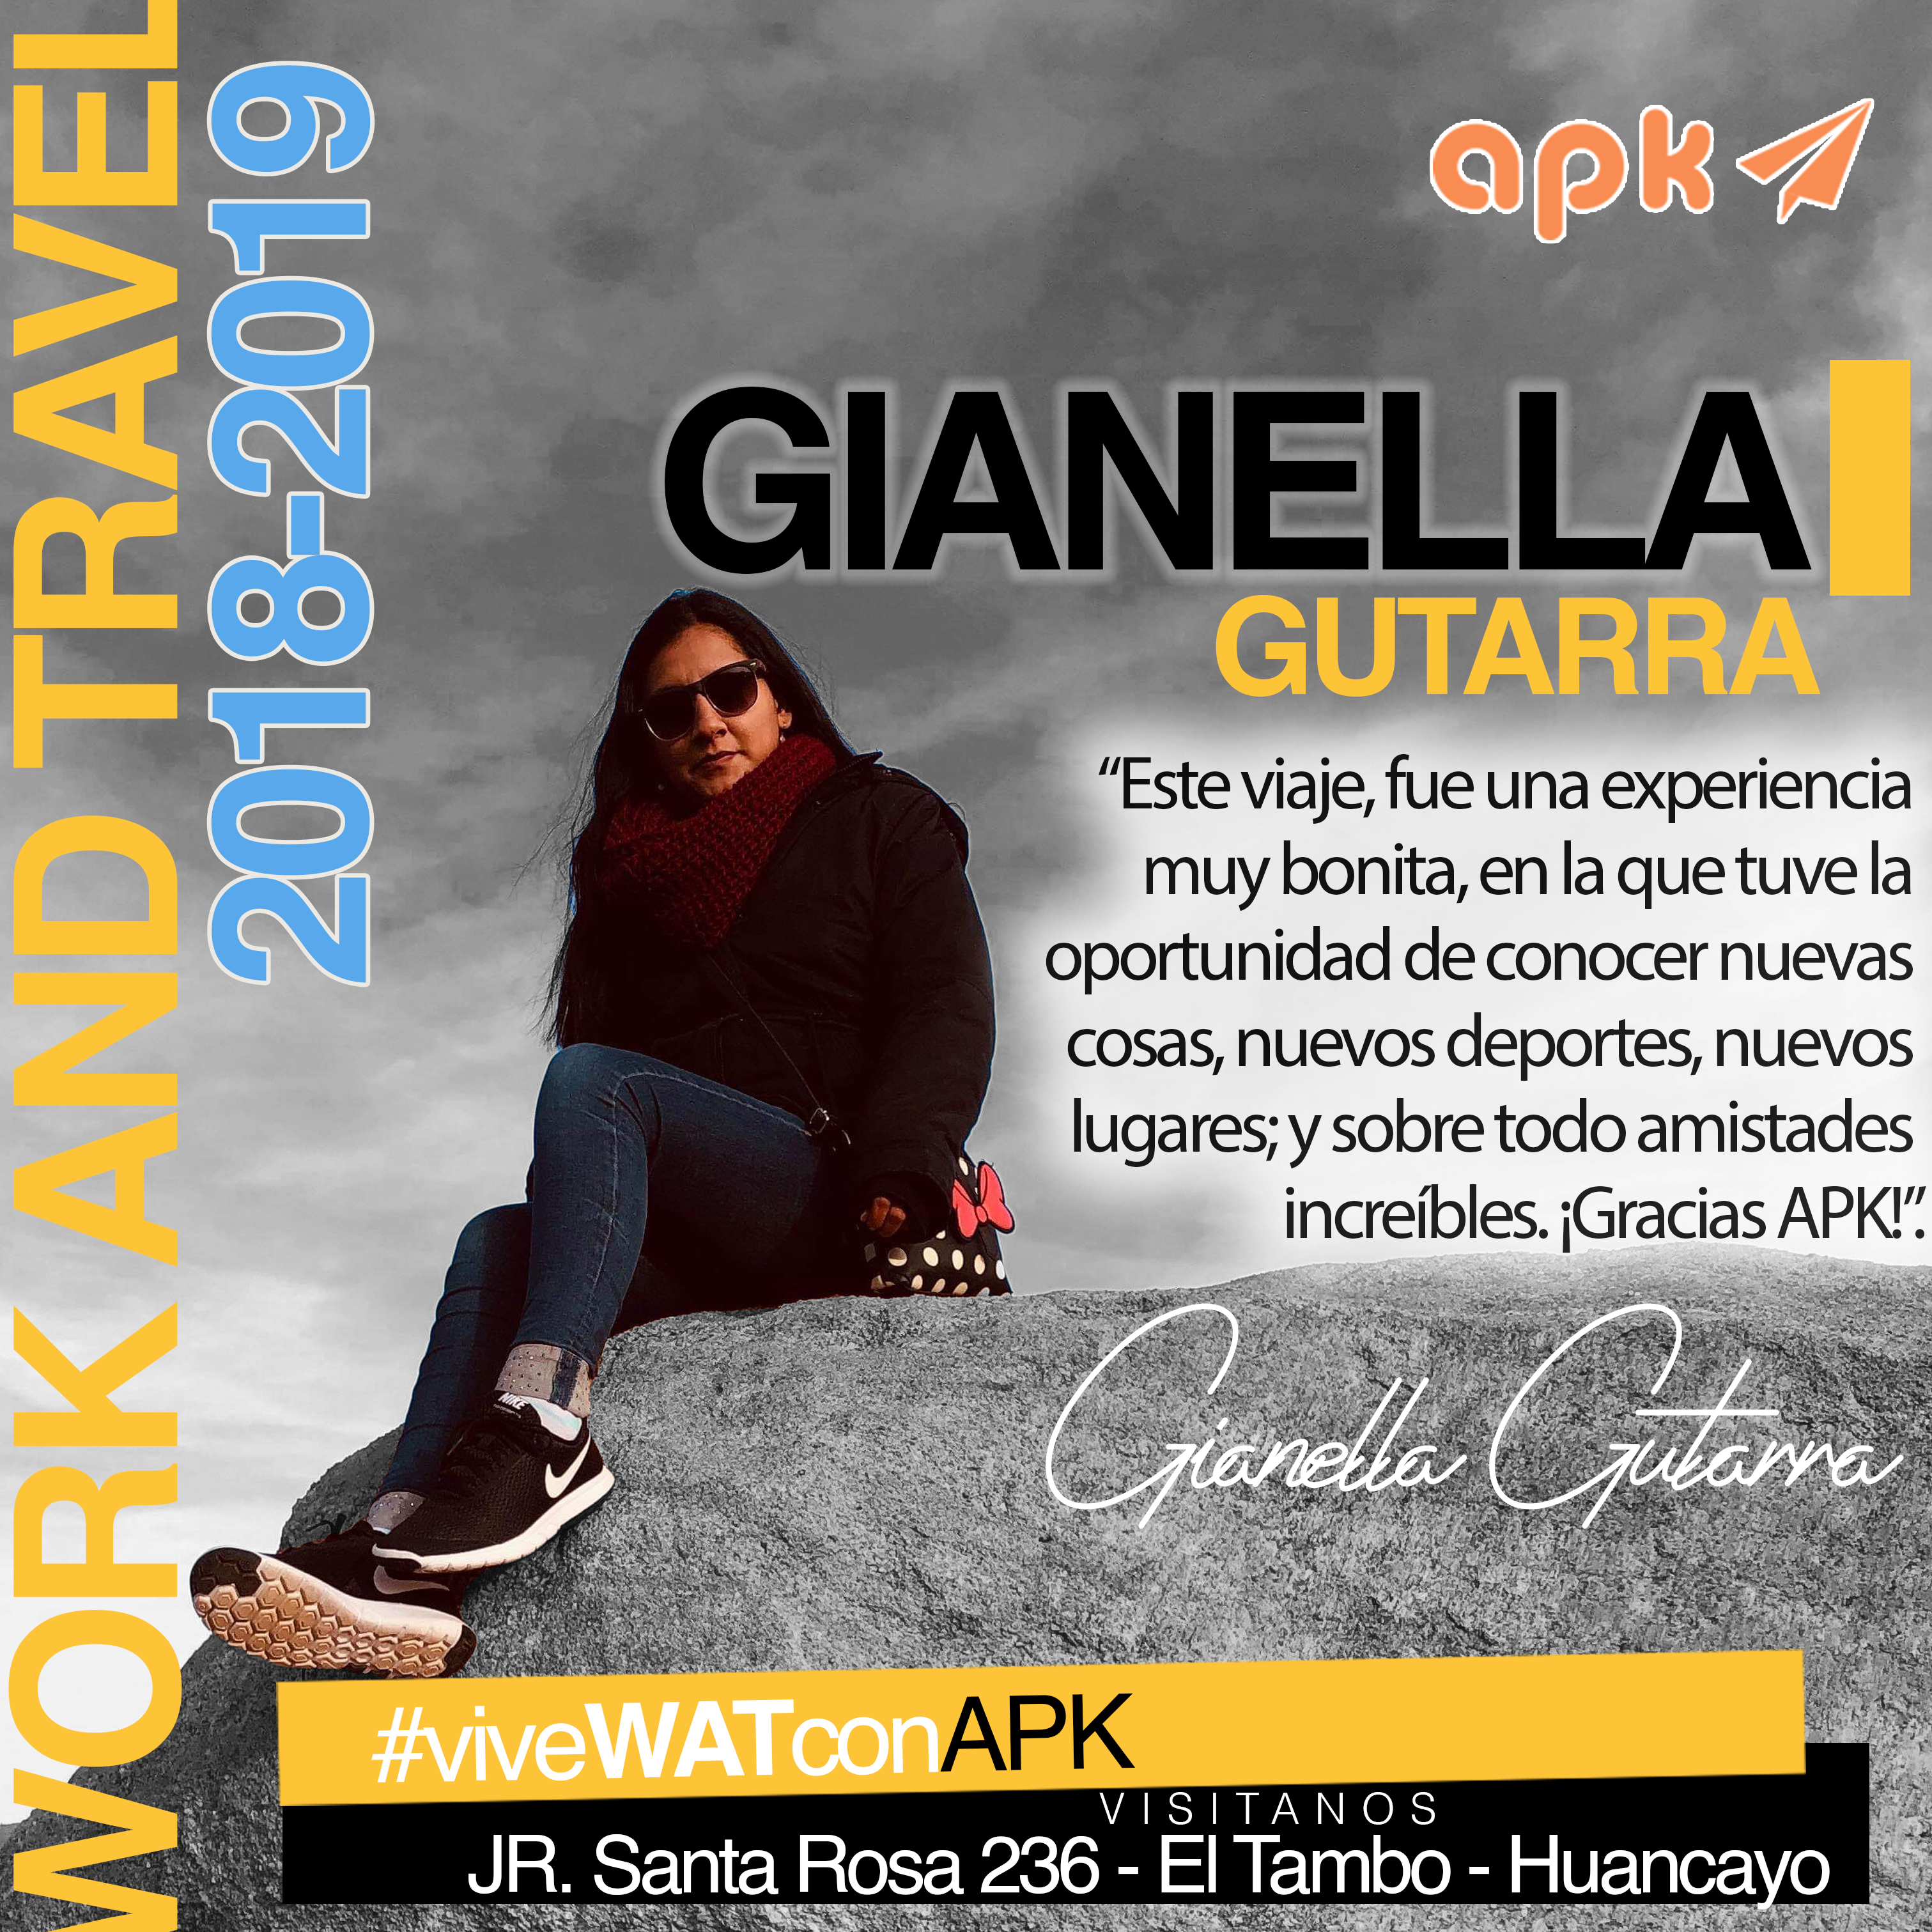 Gianella Gutarra